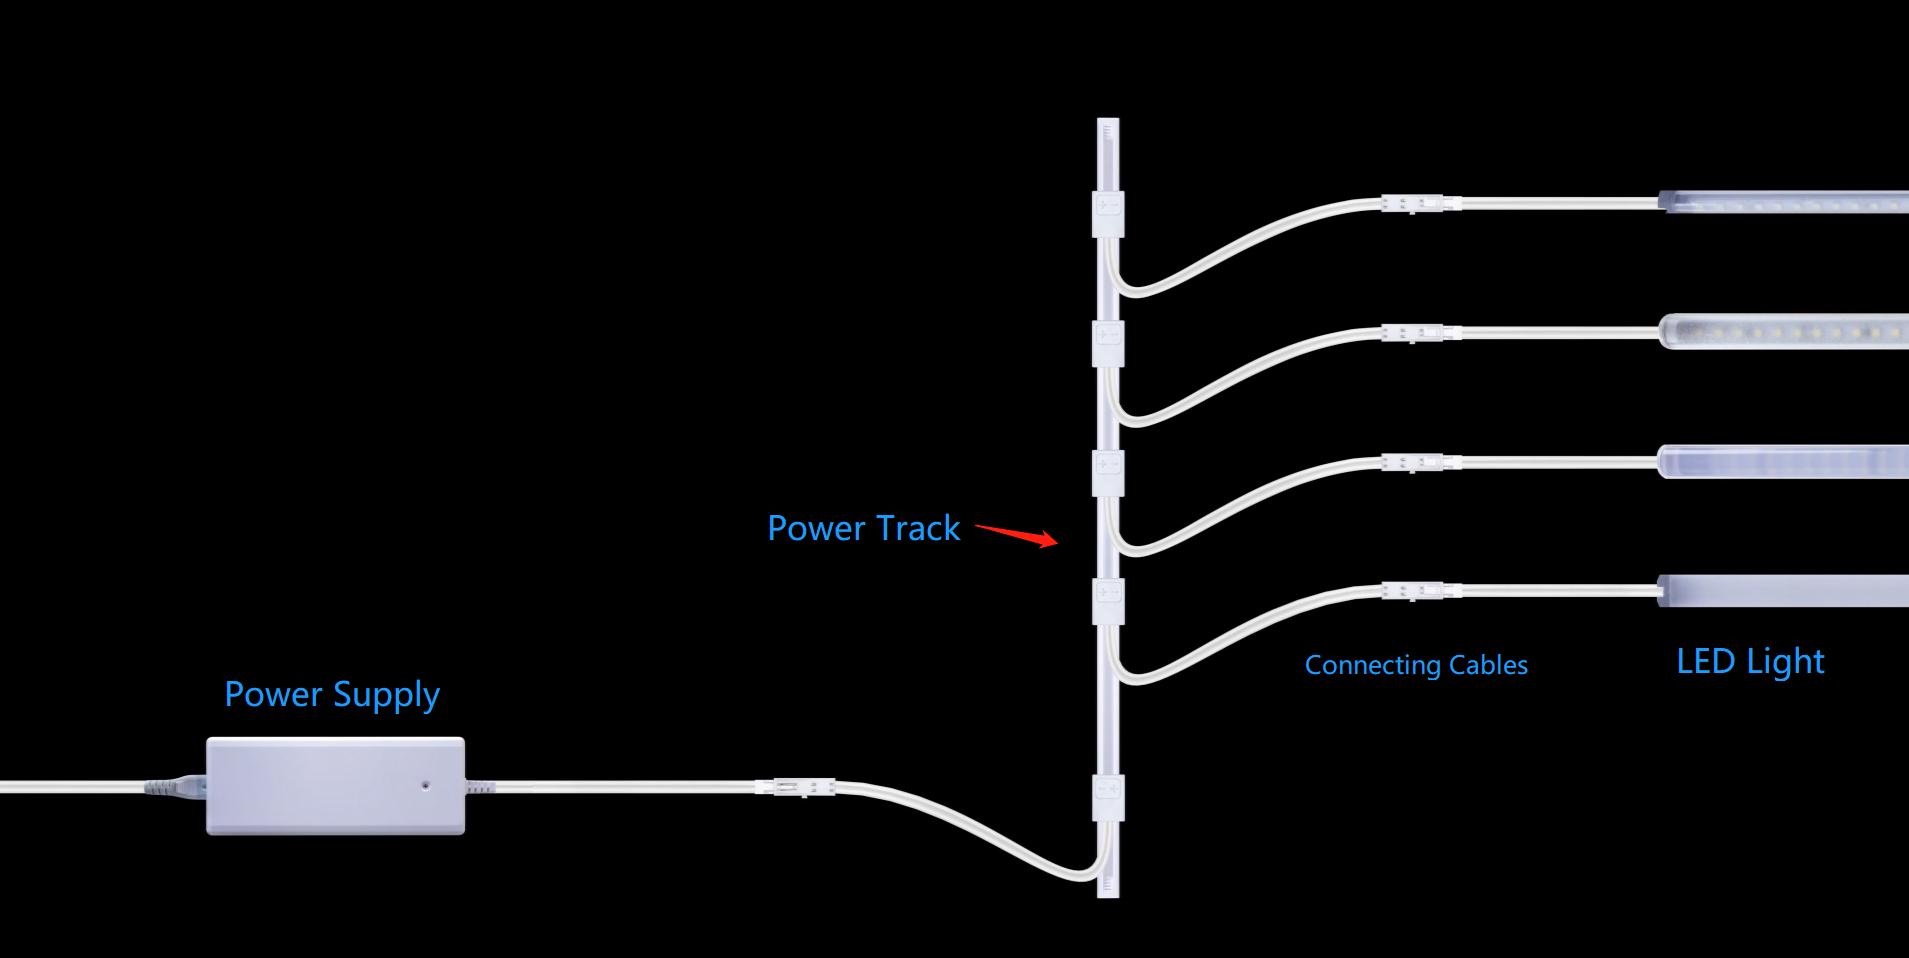 Ul Approved Dc Power Track For Shelf Lighting Led Strips